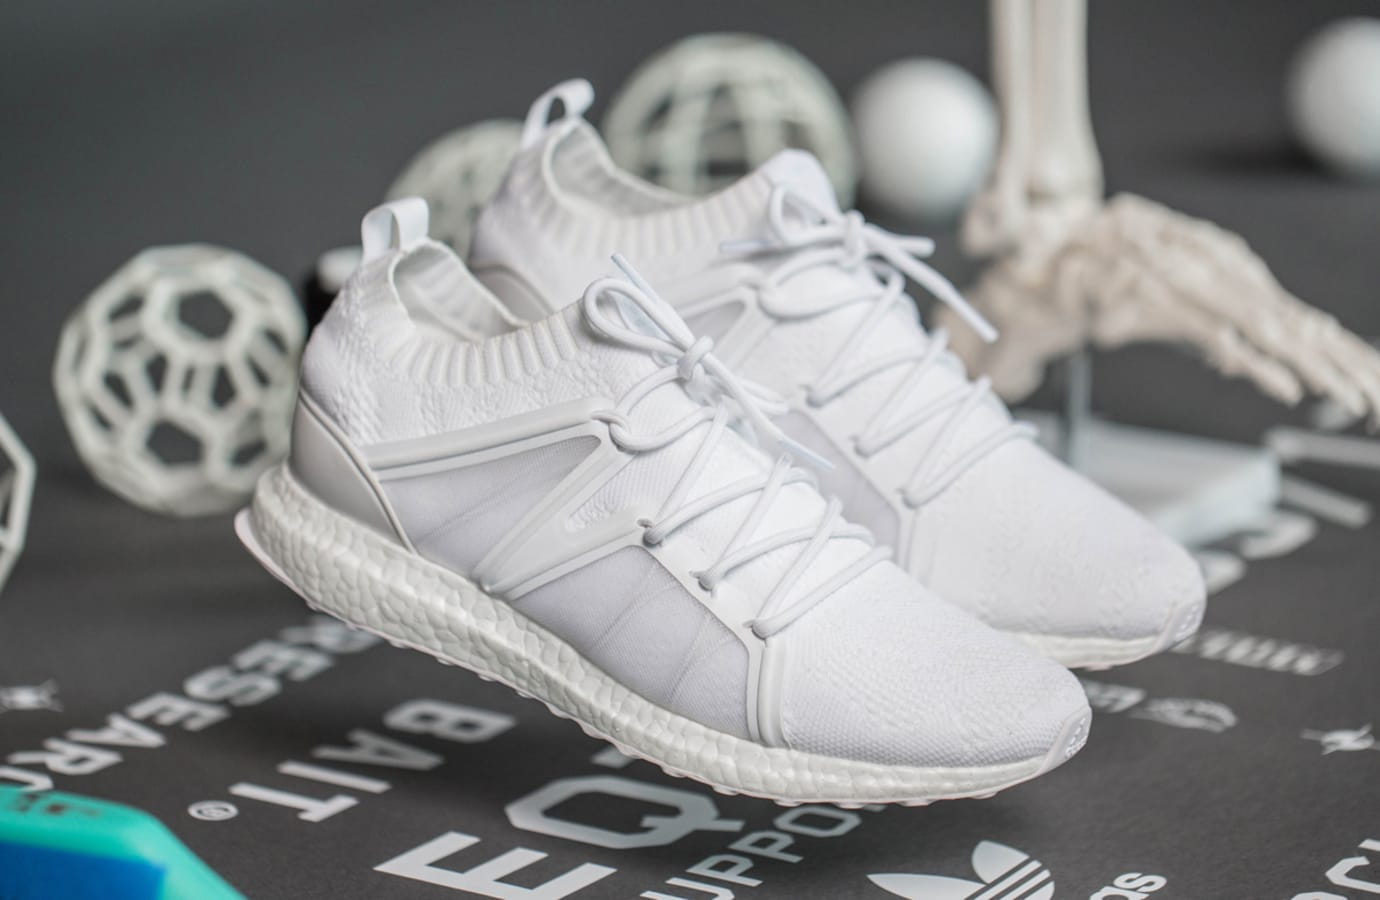 Bait Adidas EQT Support 93 16